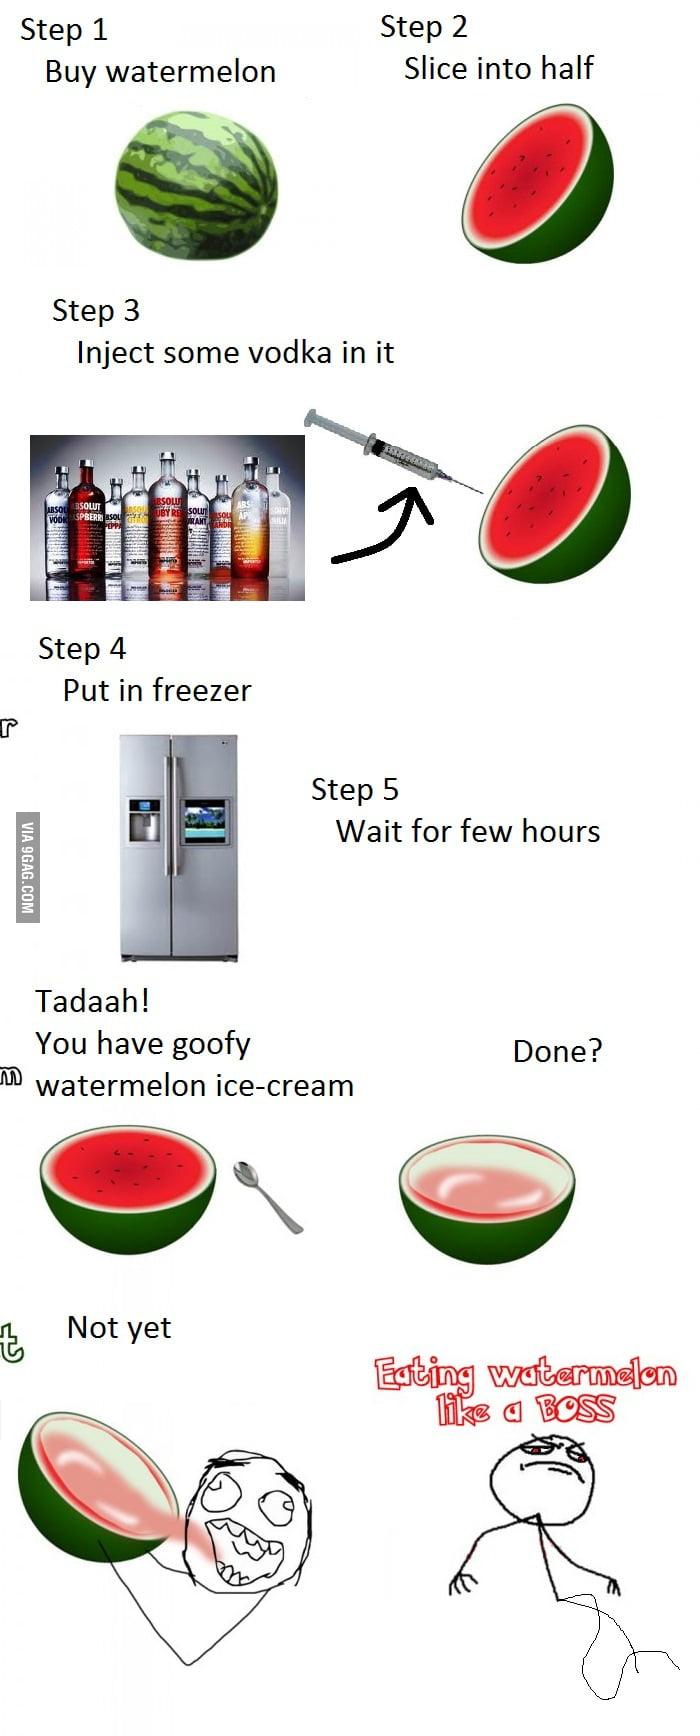 Watermelon ice-cream improvment